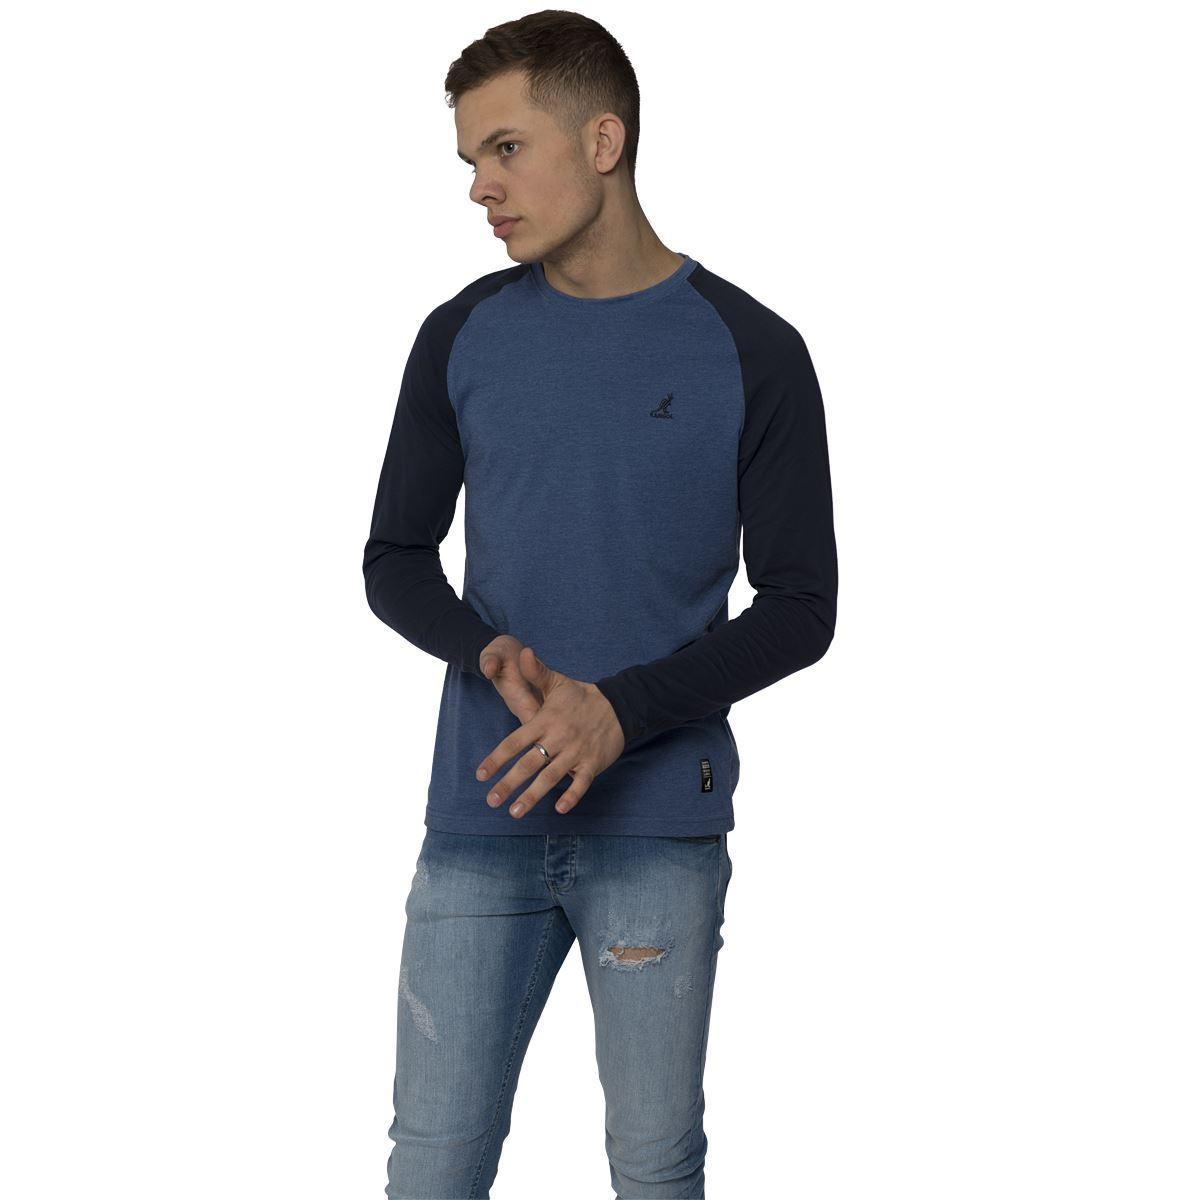 Kangol mens casual long sleeve t shirt contrast raglan for Mens casual long sleeve shirts